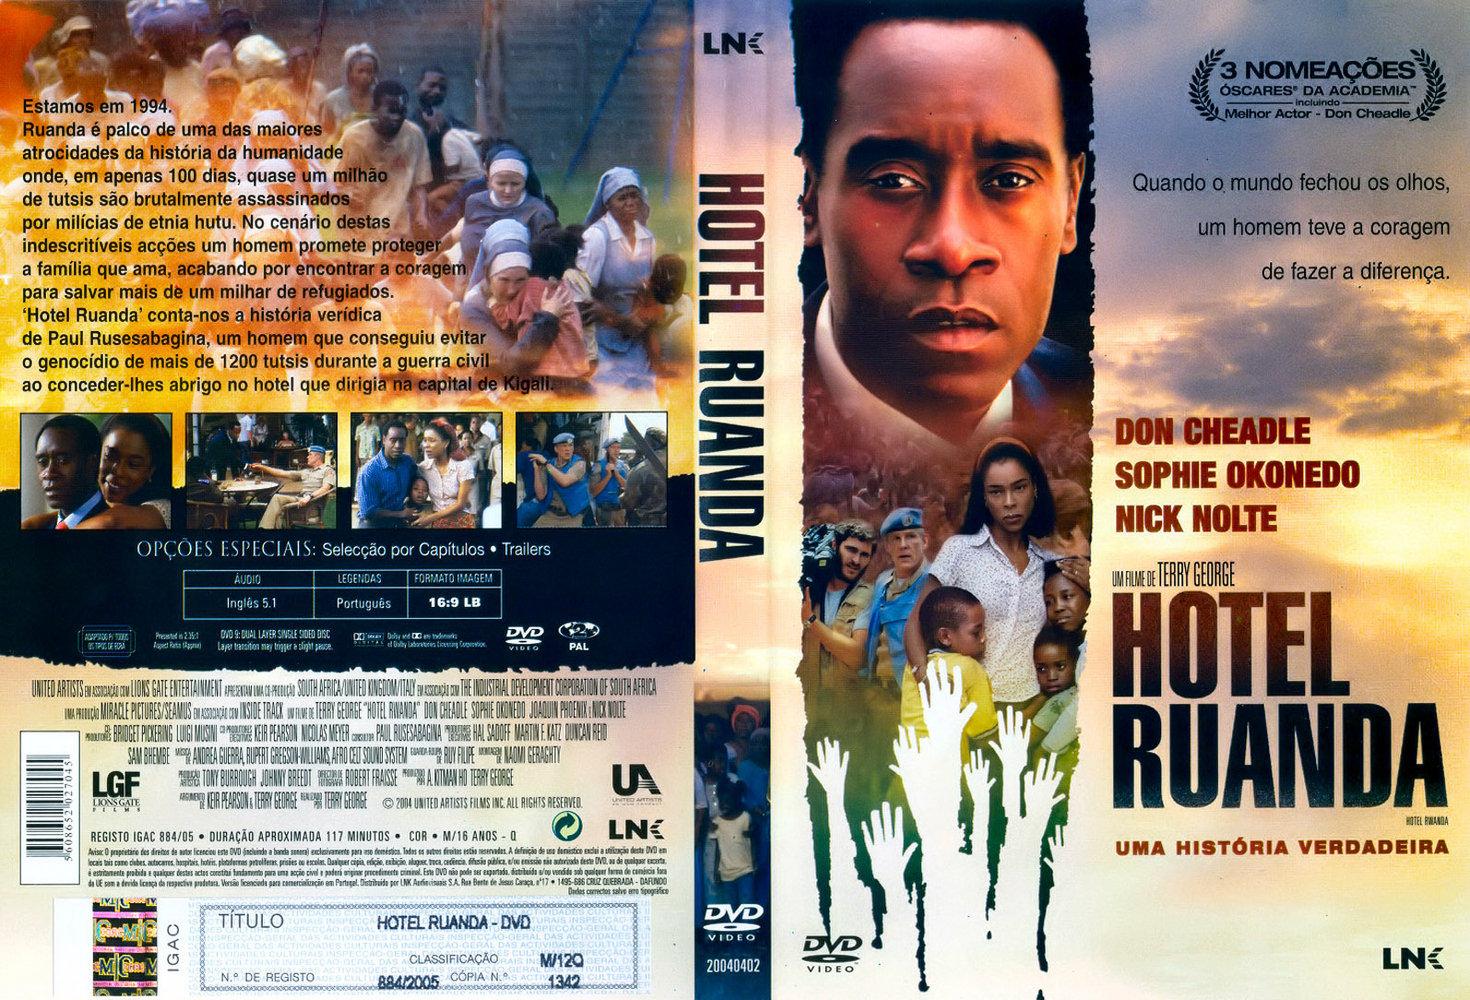 Hotel Ruanda: conflito entre tutsis e hutus - genocídio de 1994